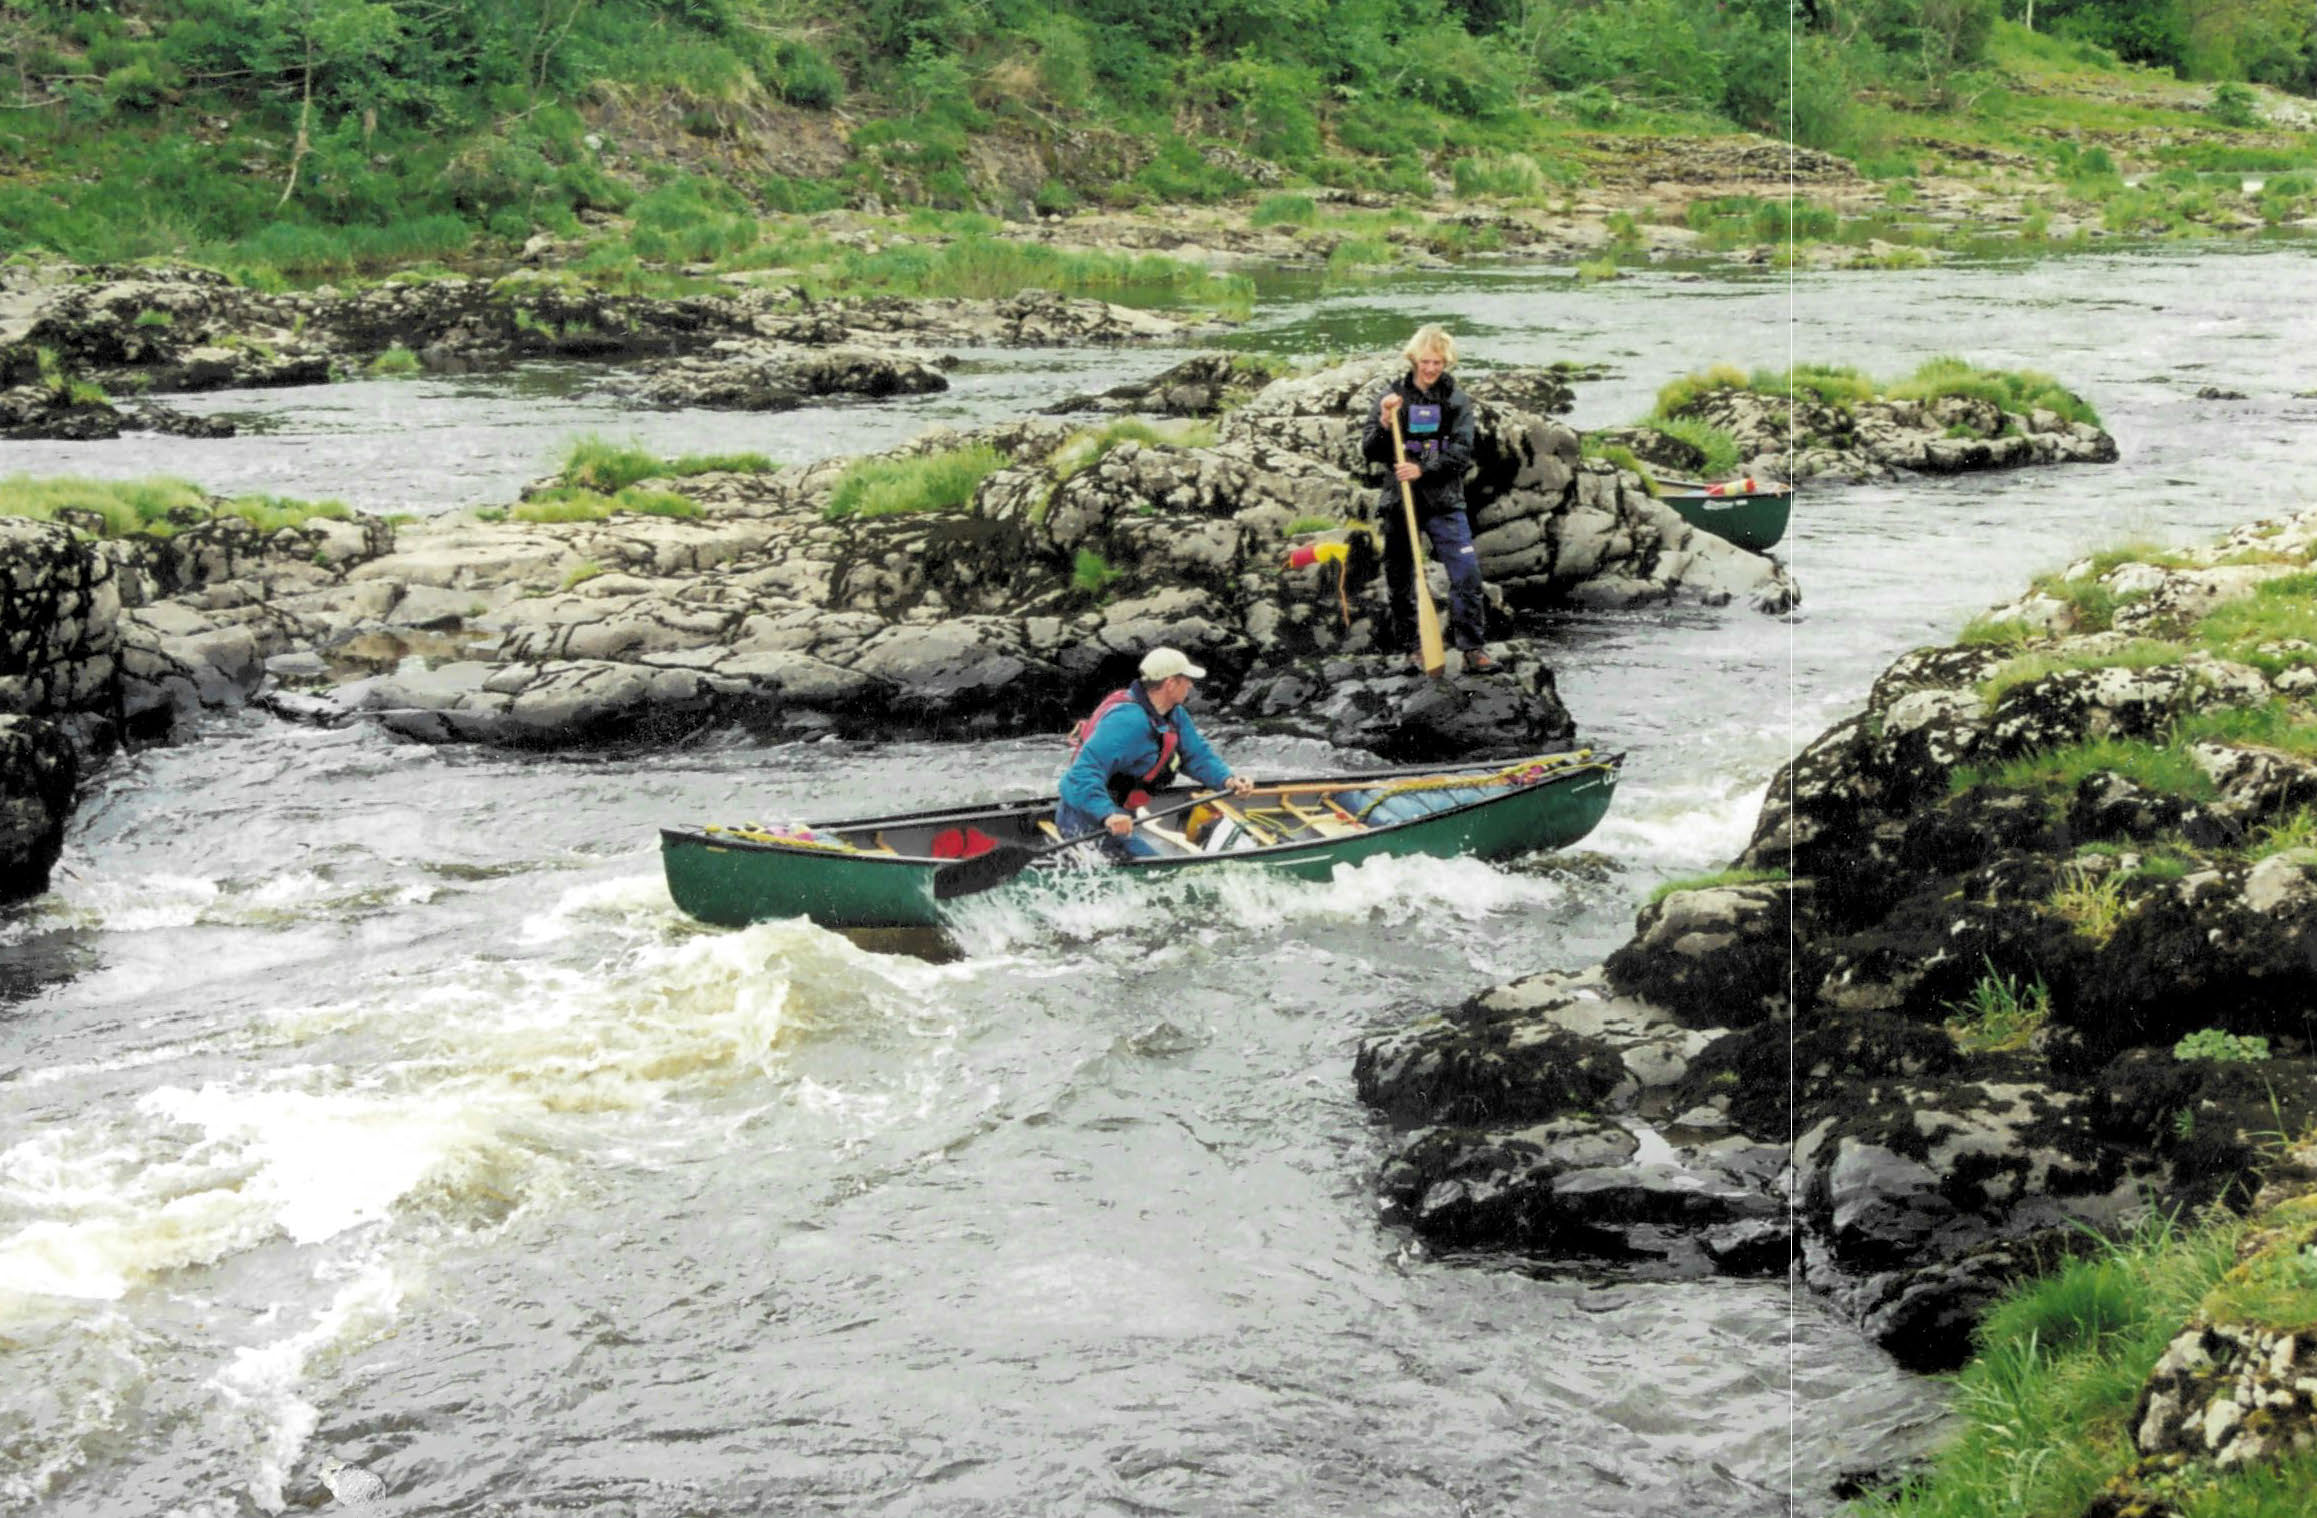 Canoeing Upper Wye